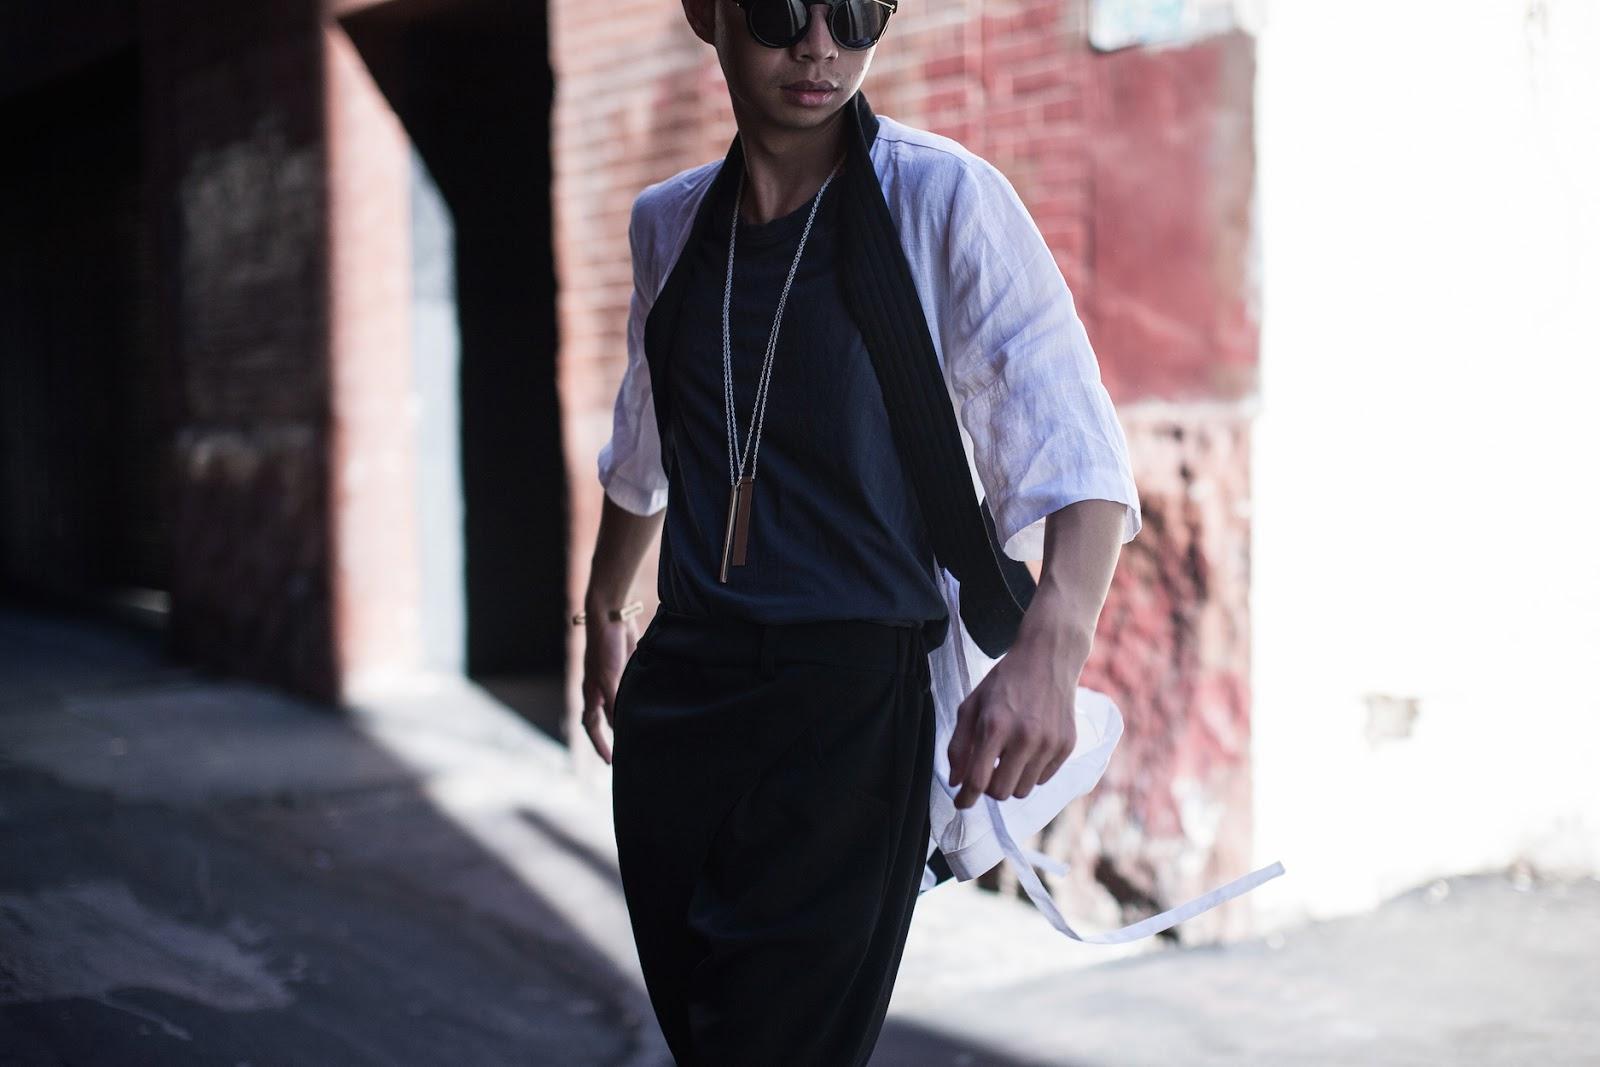 mybelonging-tommylei-menswearblogger-lura-brand-eyewear-3paradis-6.jpg